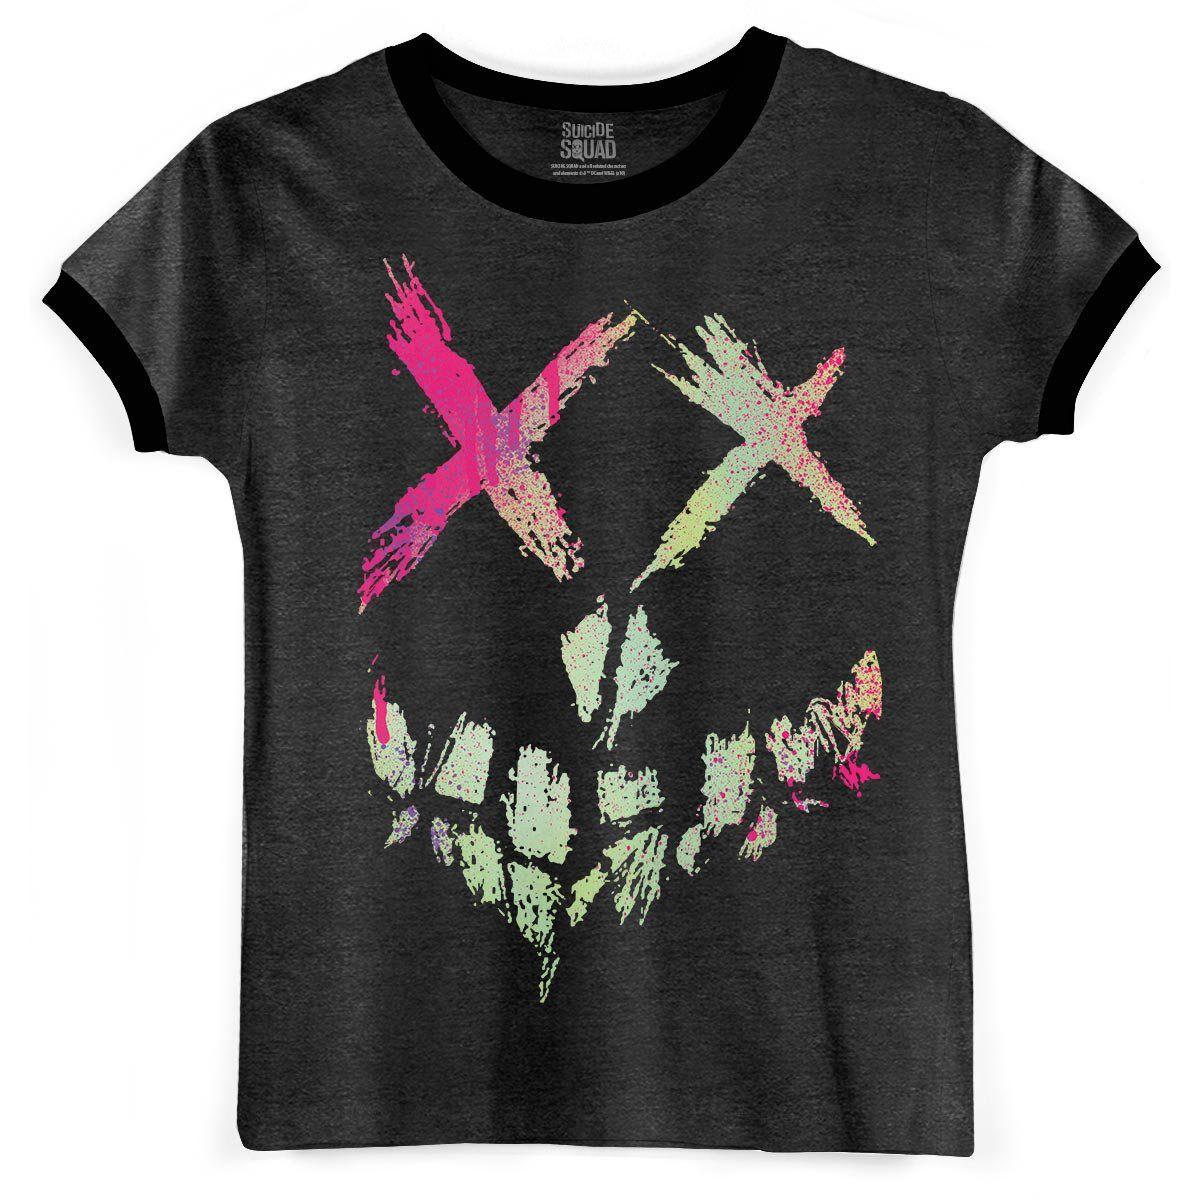 Camiseta Ringer Feminina Esquadrão Suicida Skull Logo  - bandUP Store Marketplace